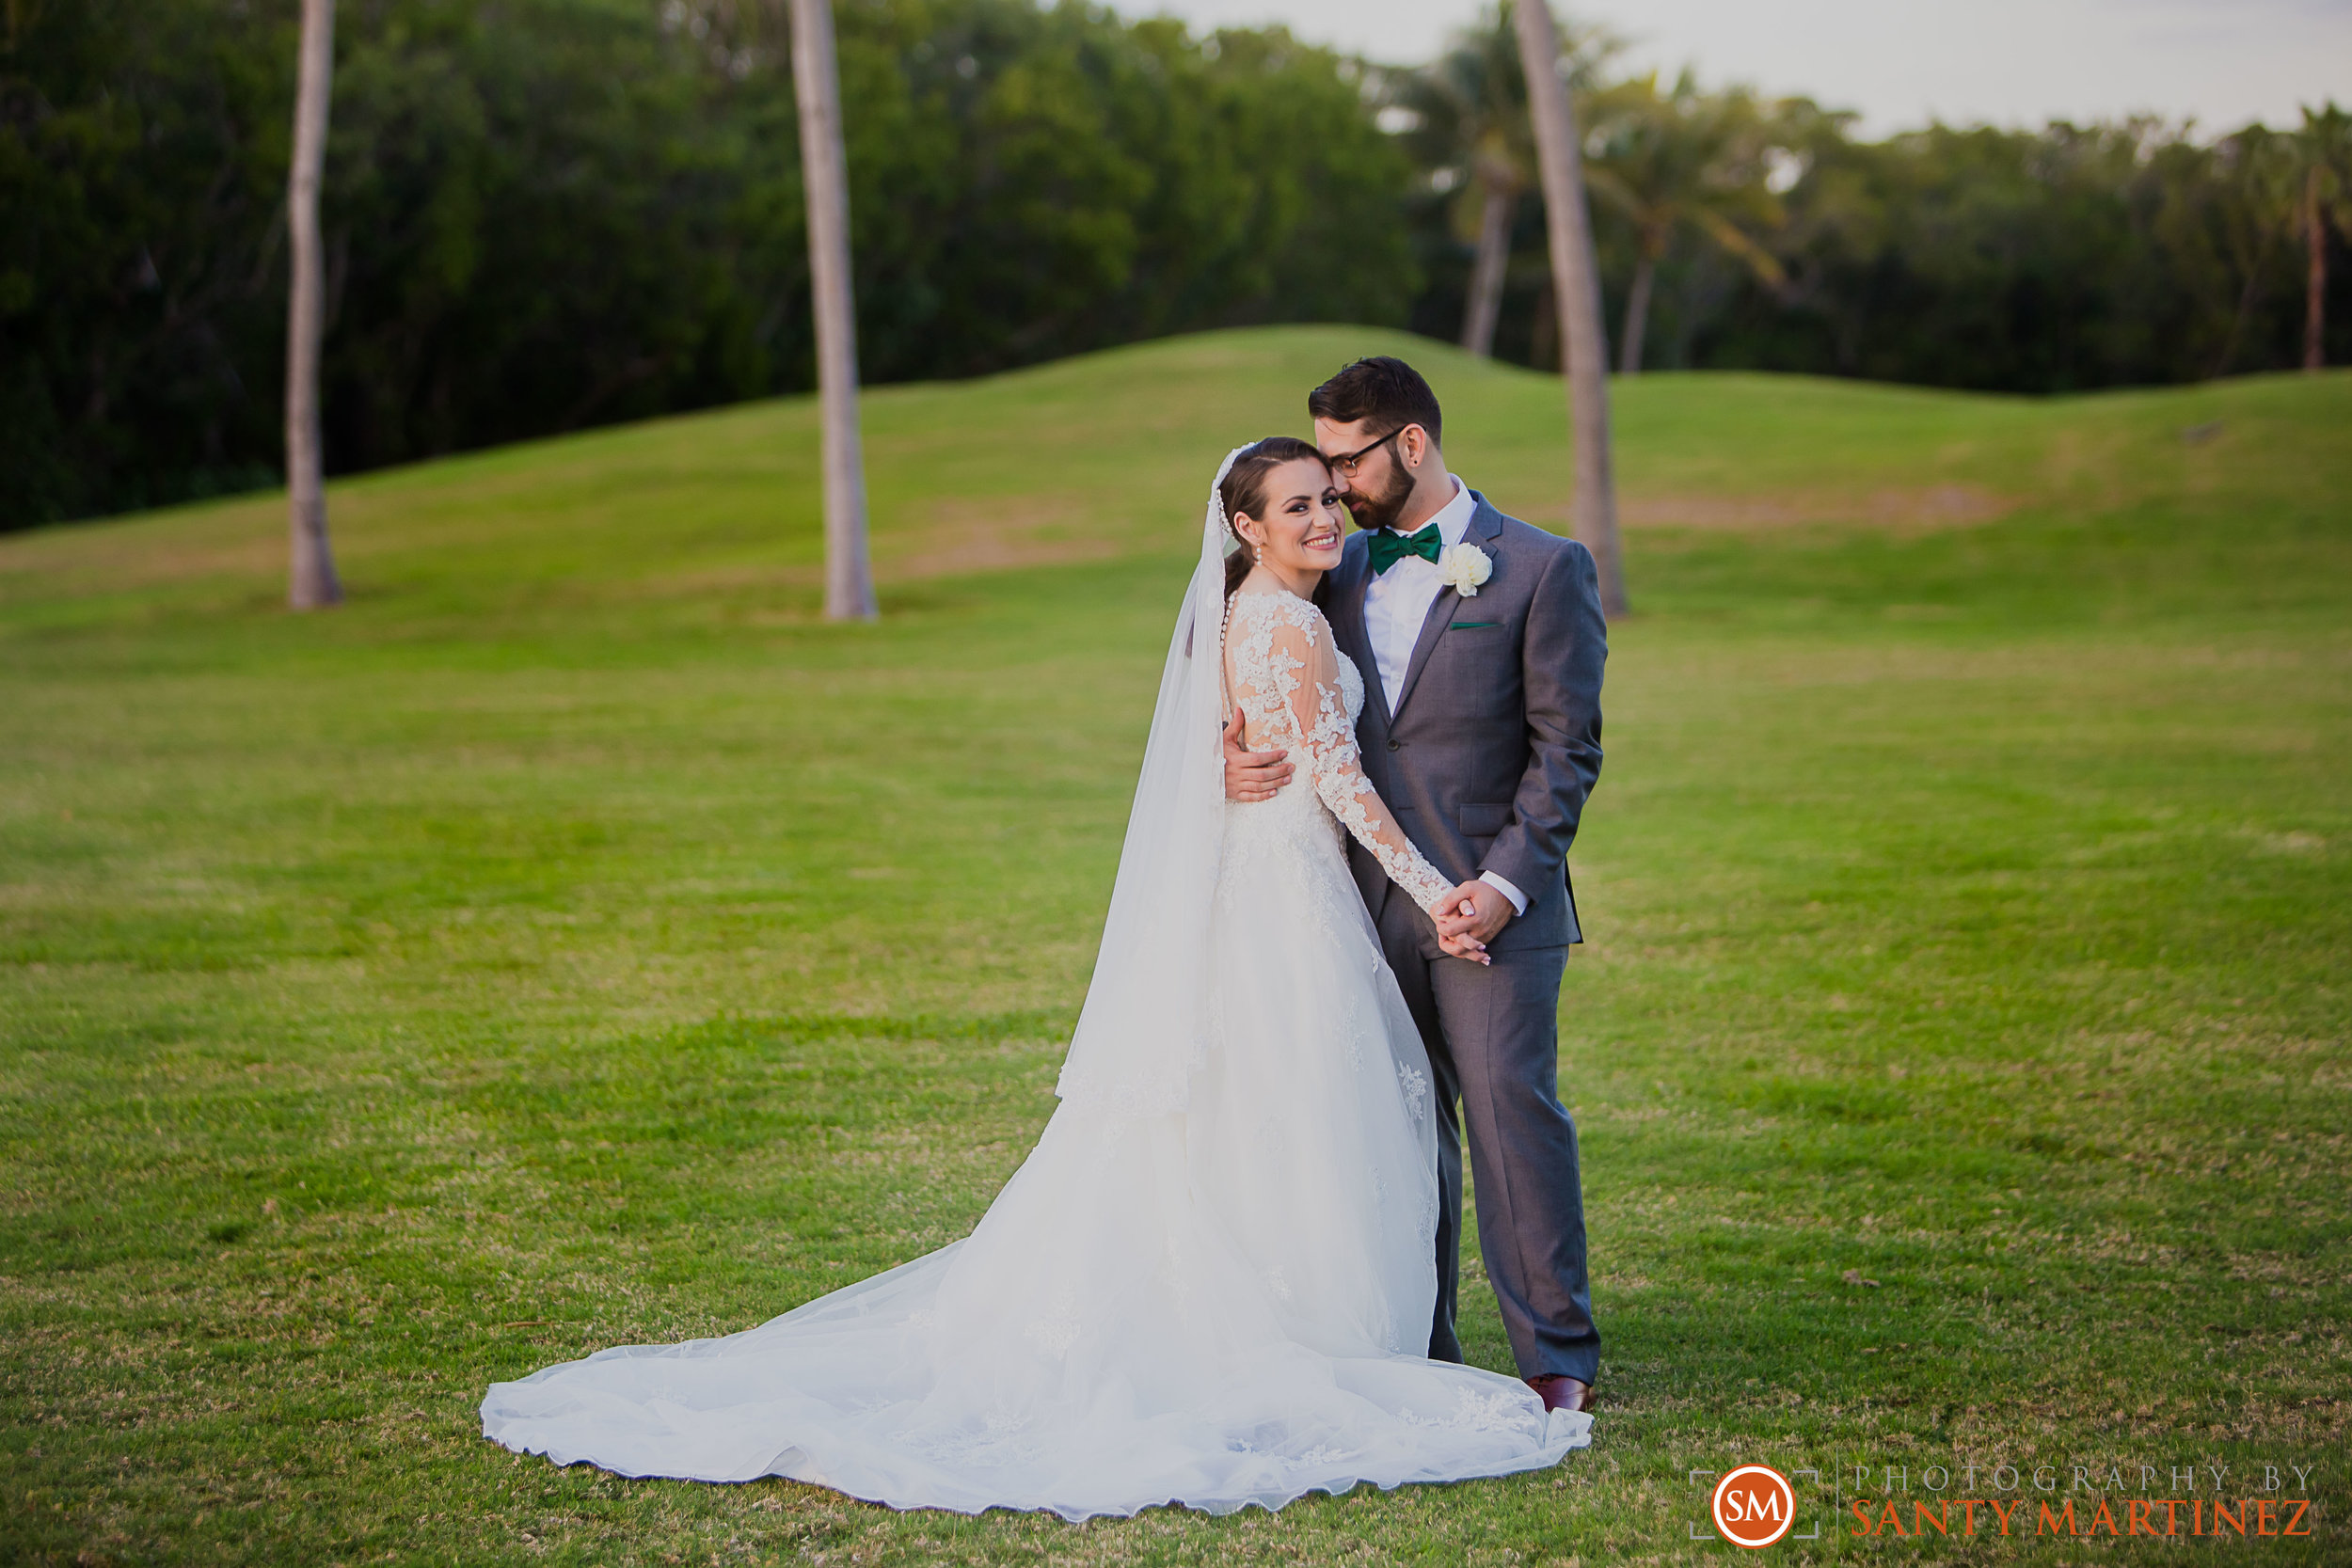 Wedding - Fairways - Crandon Park - Santy Martinez-20.jpg